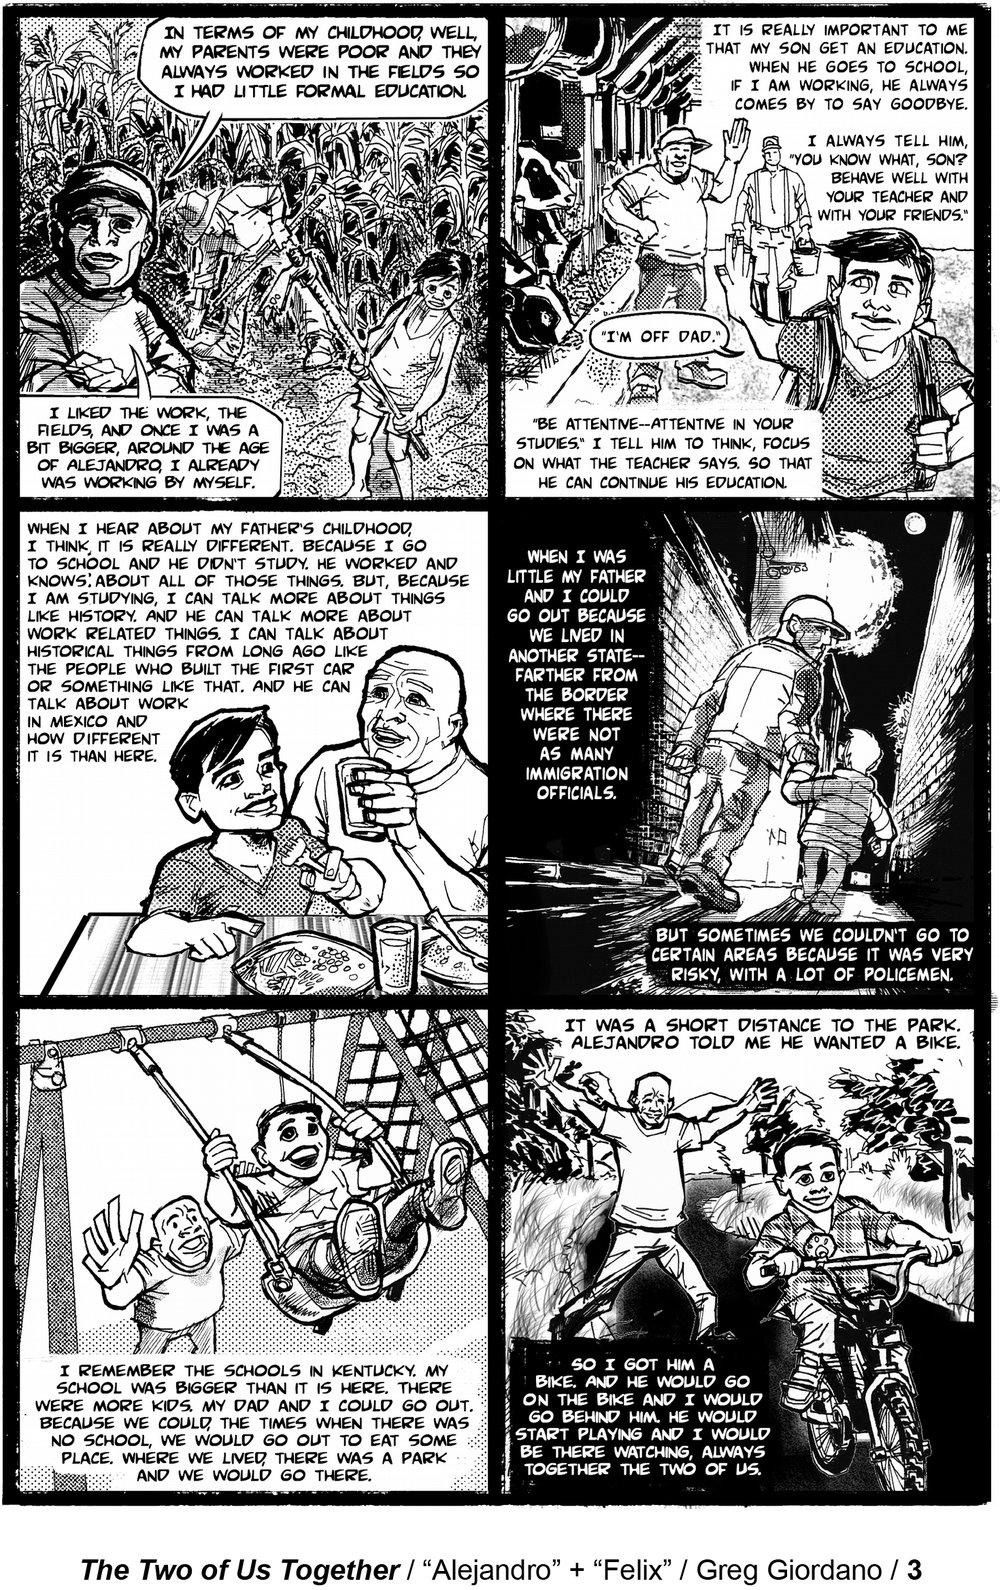 BOOKLET-Alejandro+Felix+Greg-171200-Digest_ENG 5.jpg